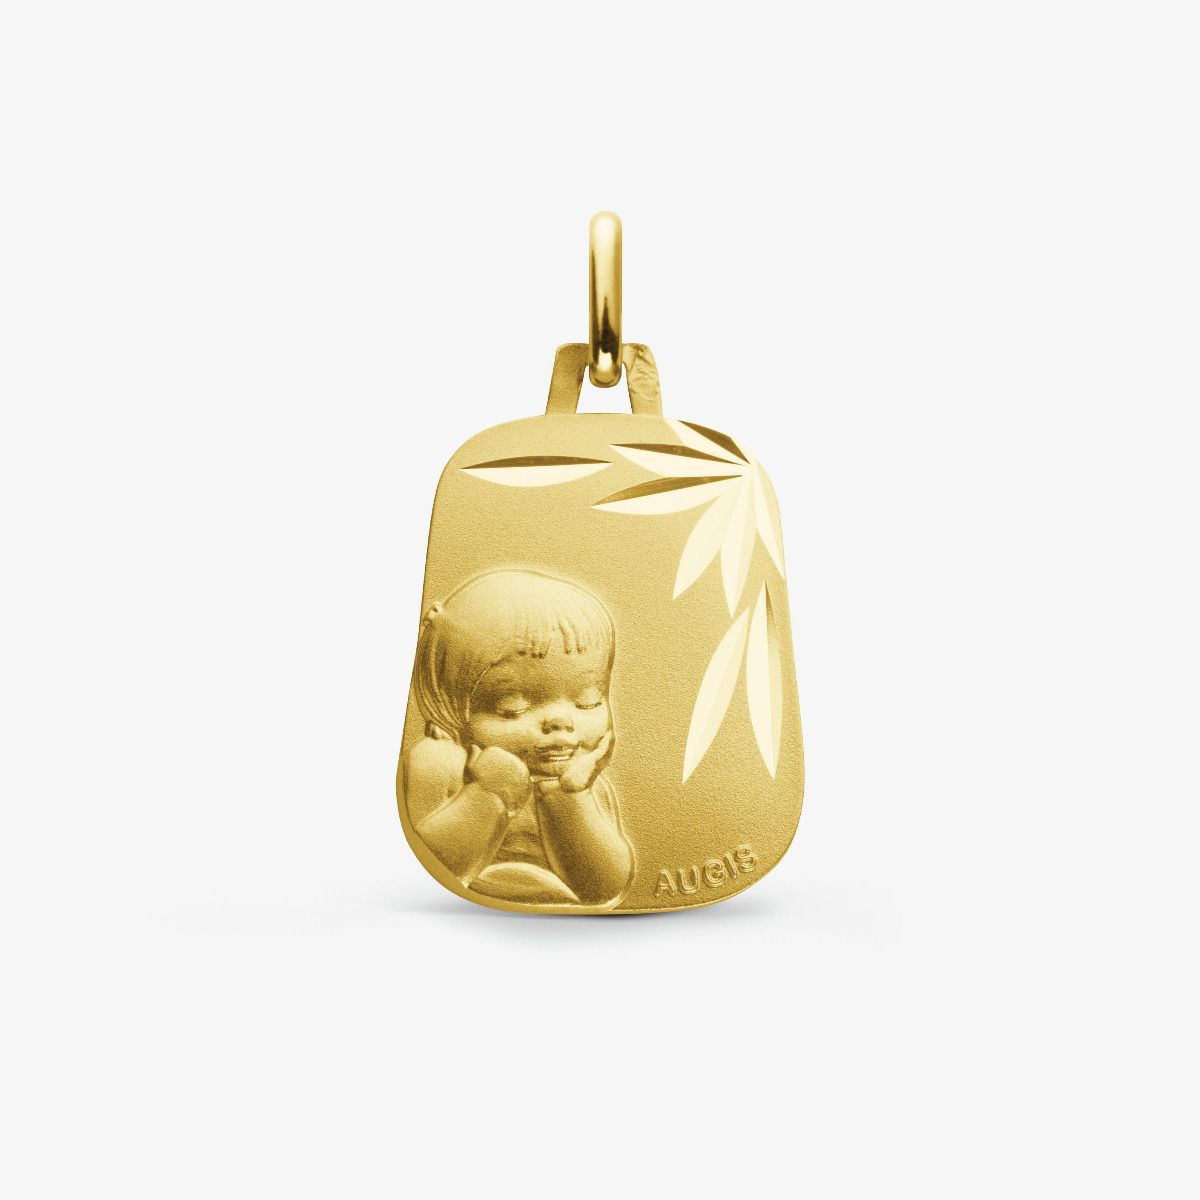 Médaille Chérubin Or Jaune 18 carats - 18 mm